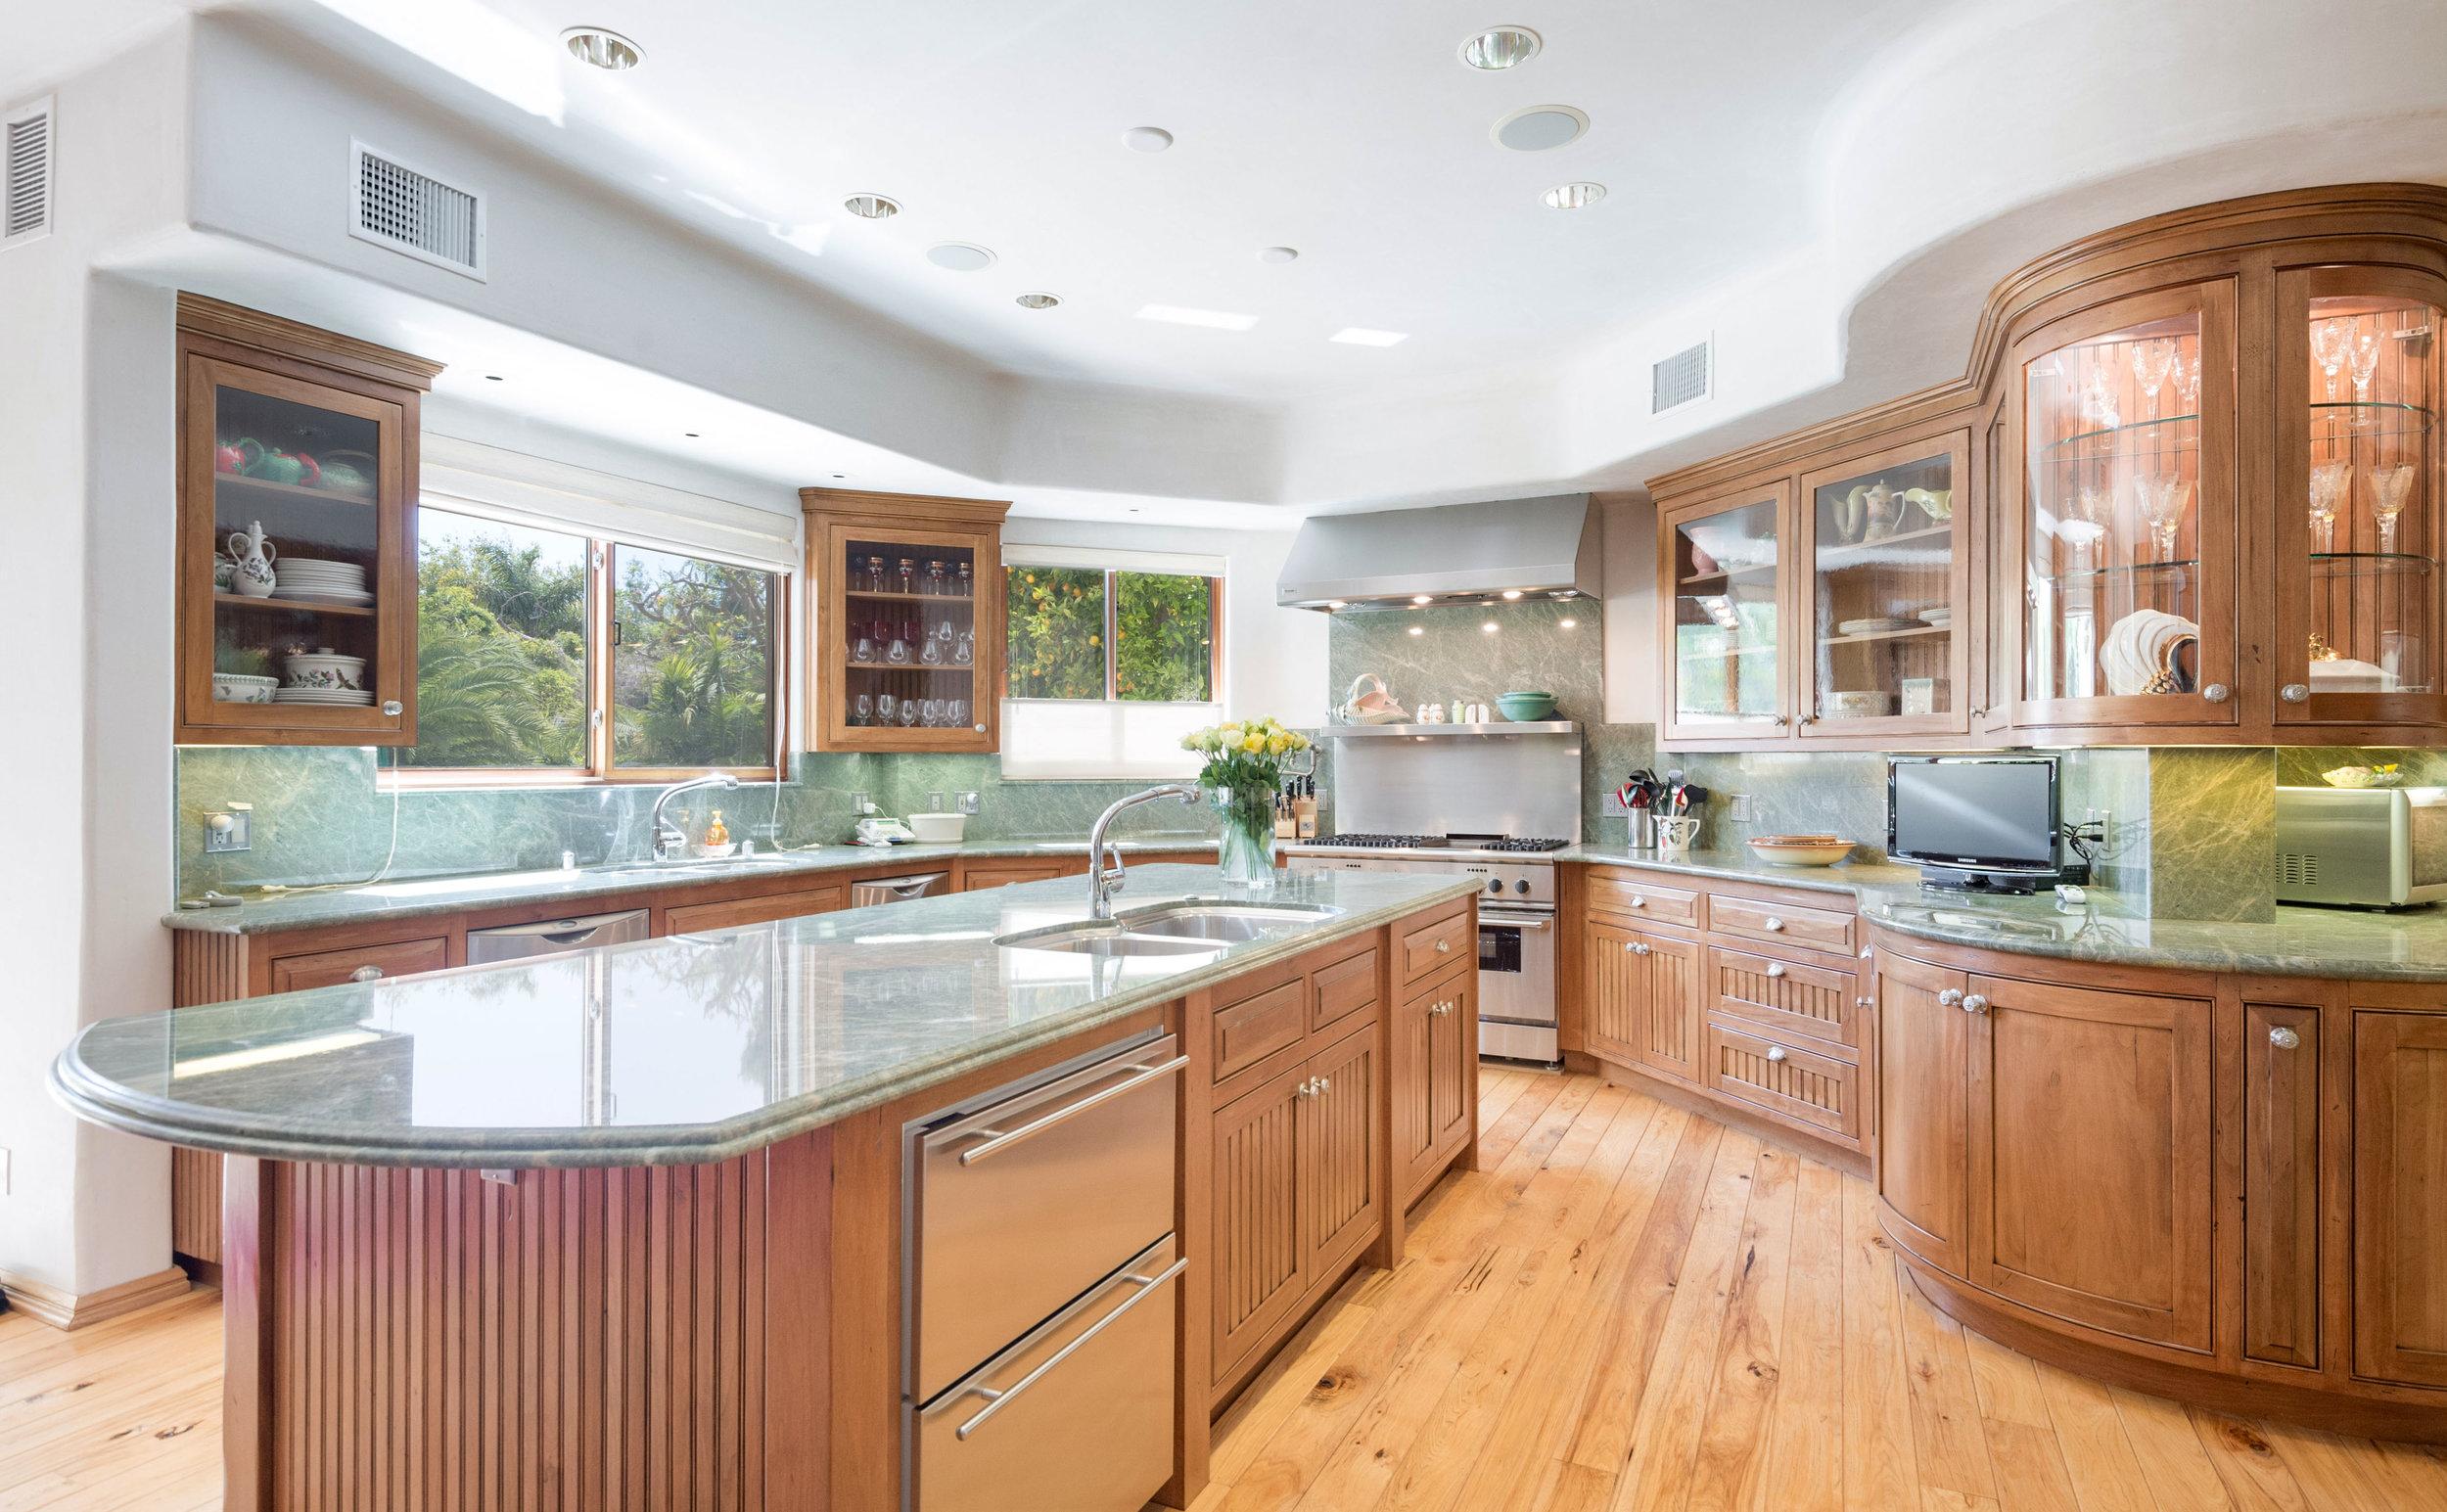 004 kitchen 6405 bonsall Malibu For Sale The Malibu Life Team Luxury Real Estate.jpg